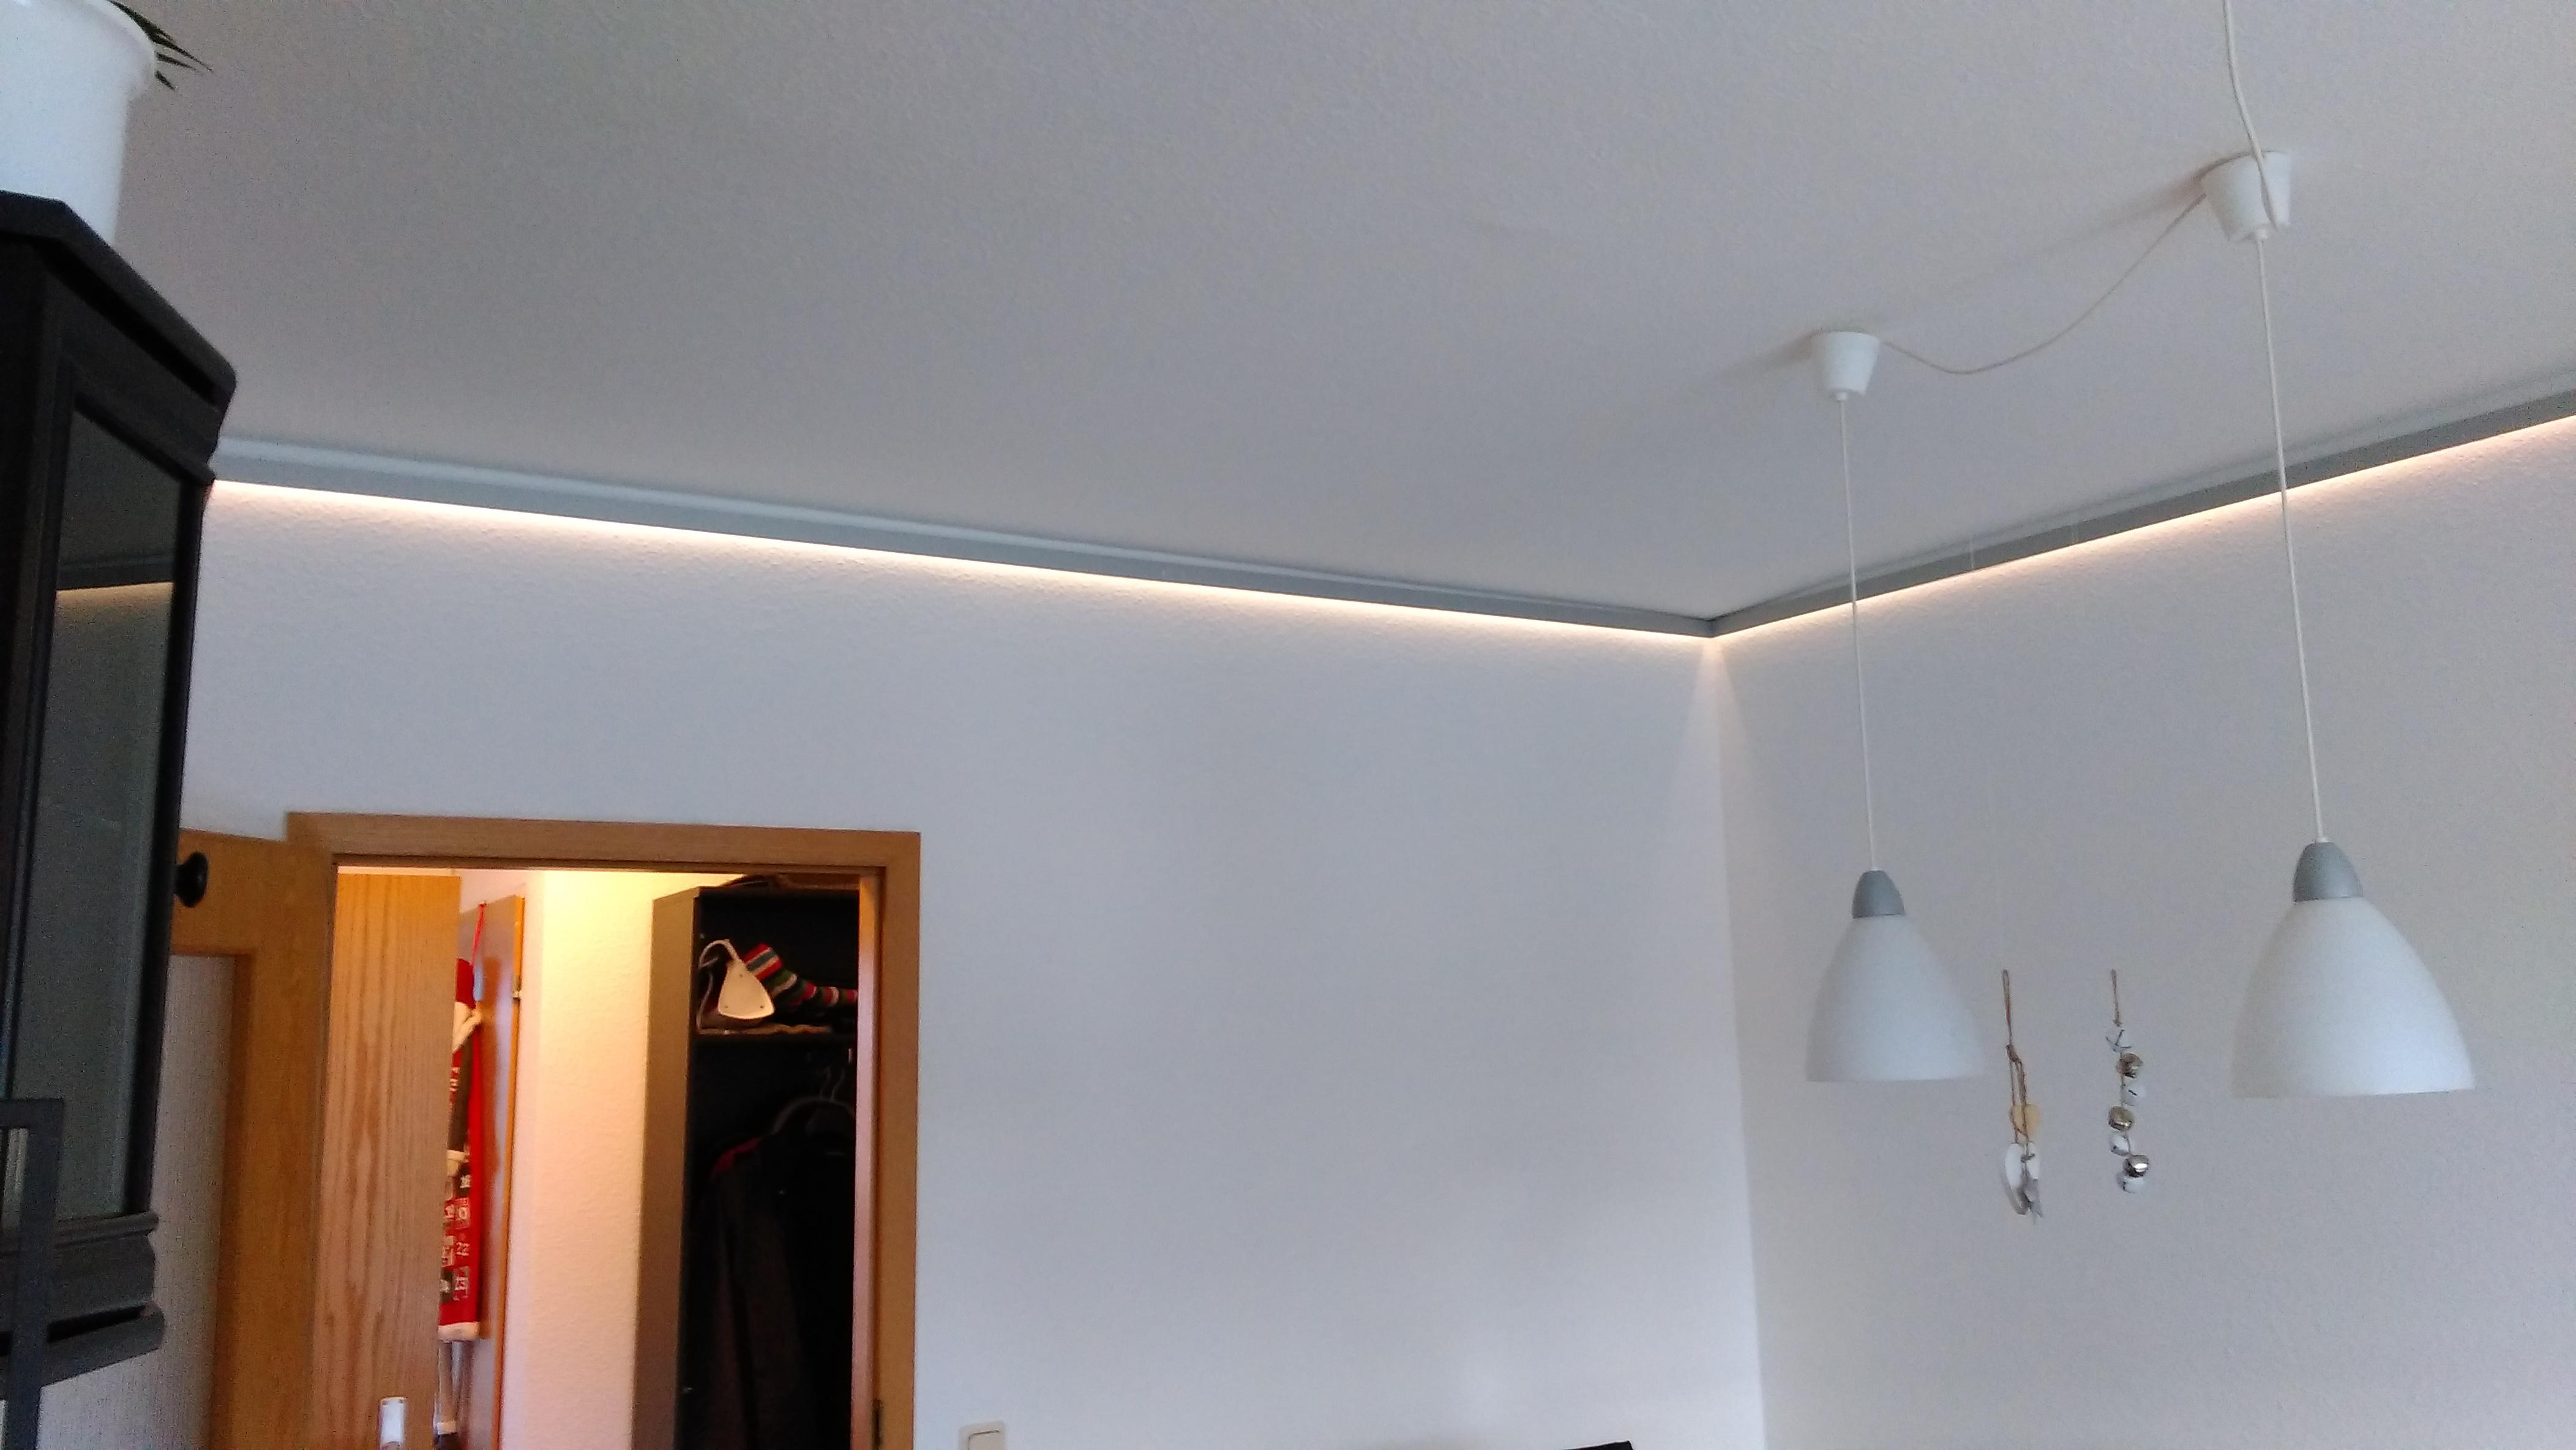 LED akzent Beleuchtung